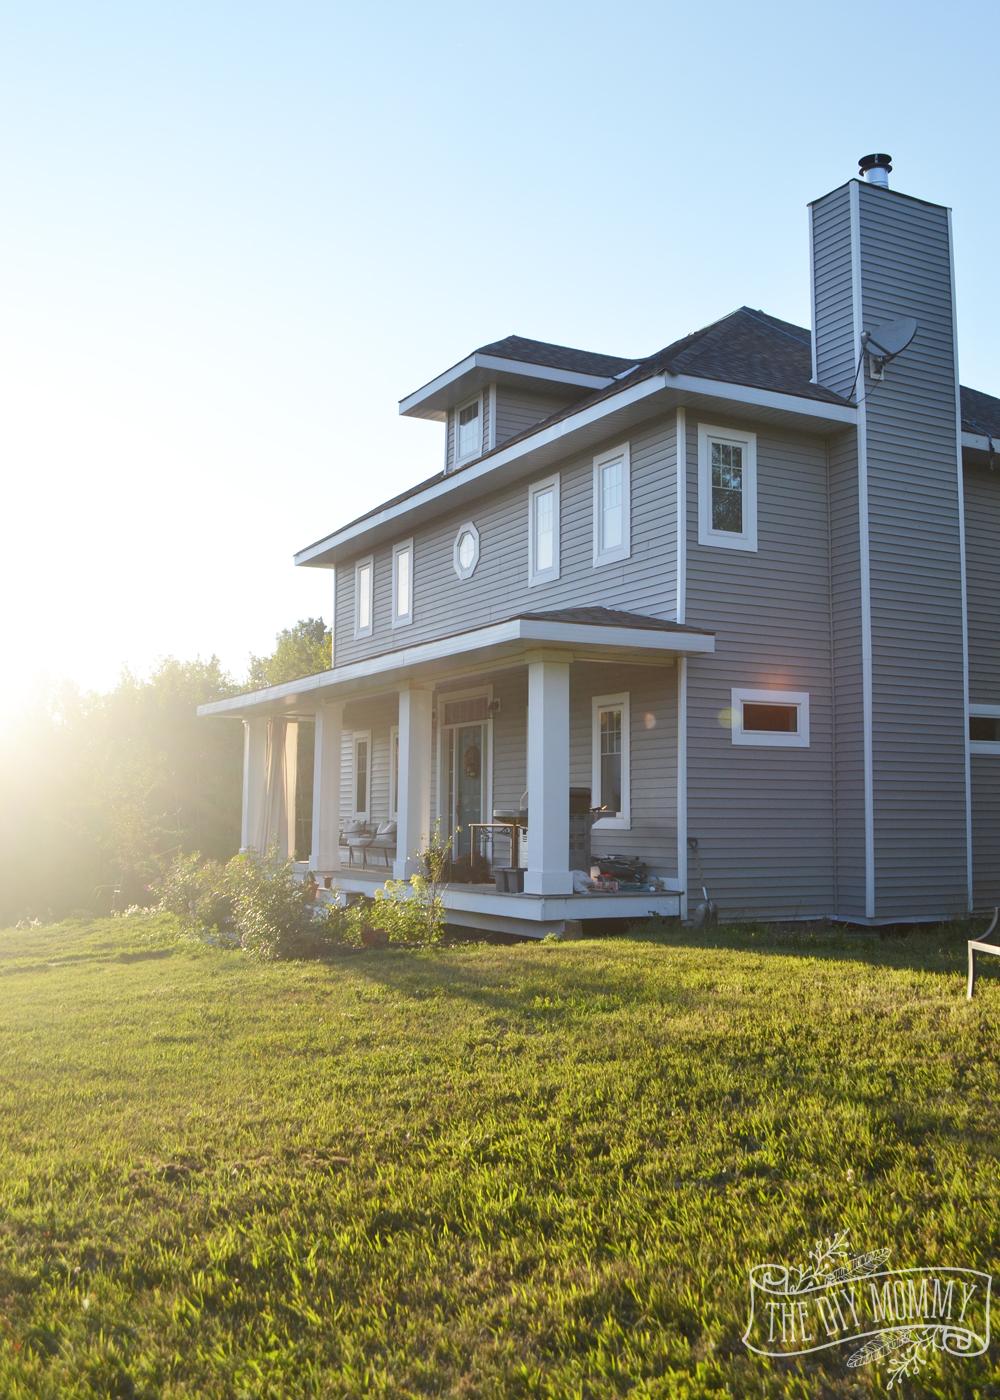 DIY Craftsman Foursquare Home with Grey Siding, Porch with DIY Columns and a Dark Teal Door